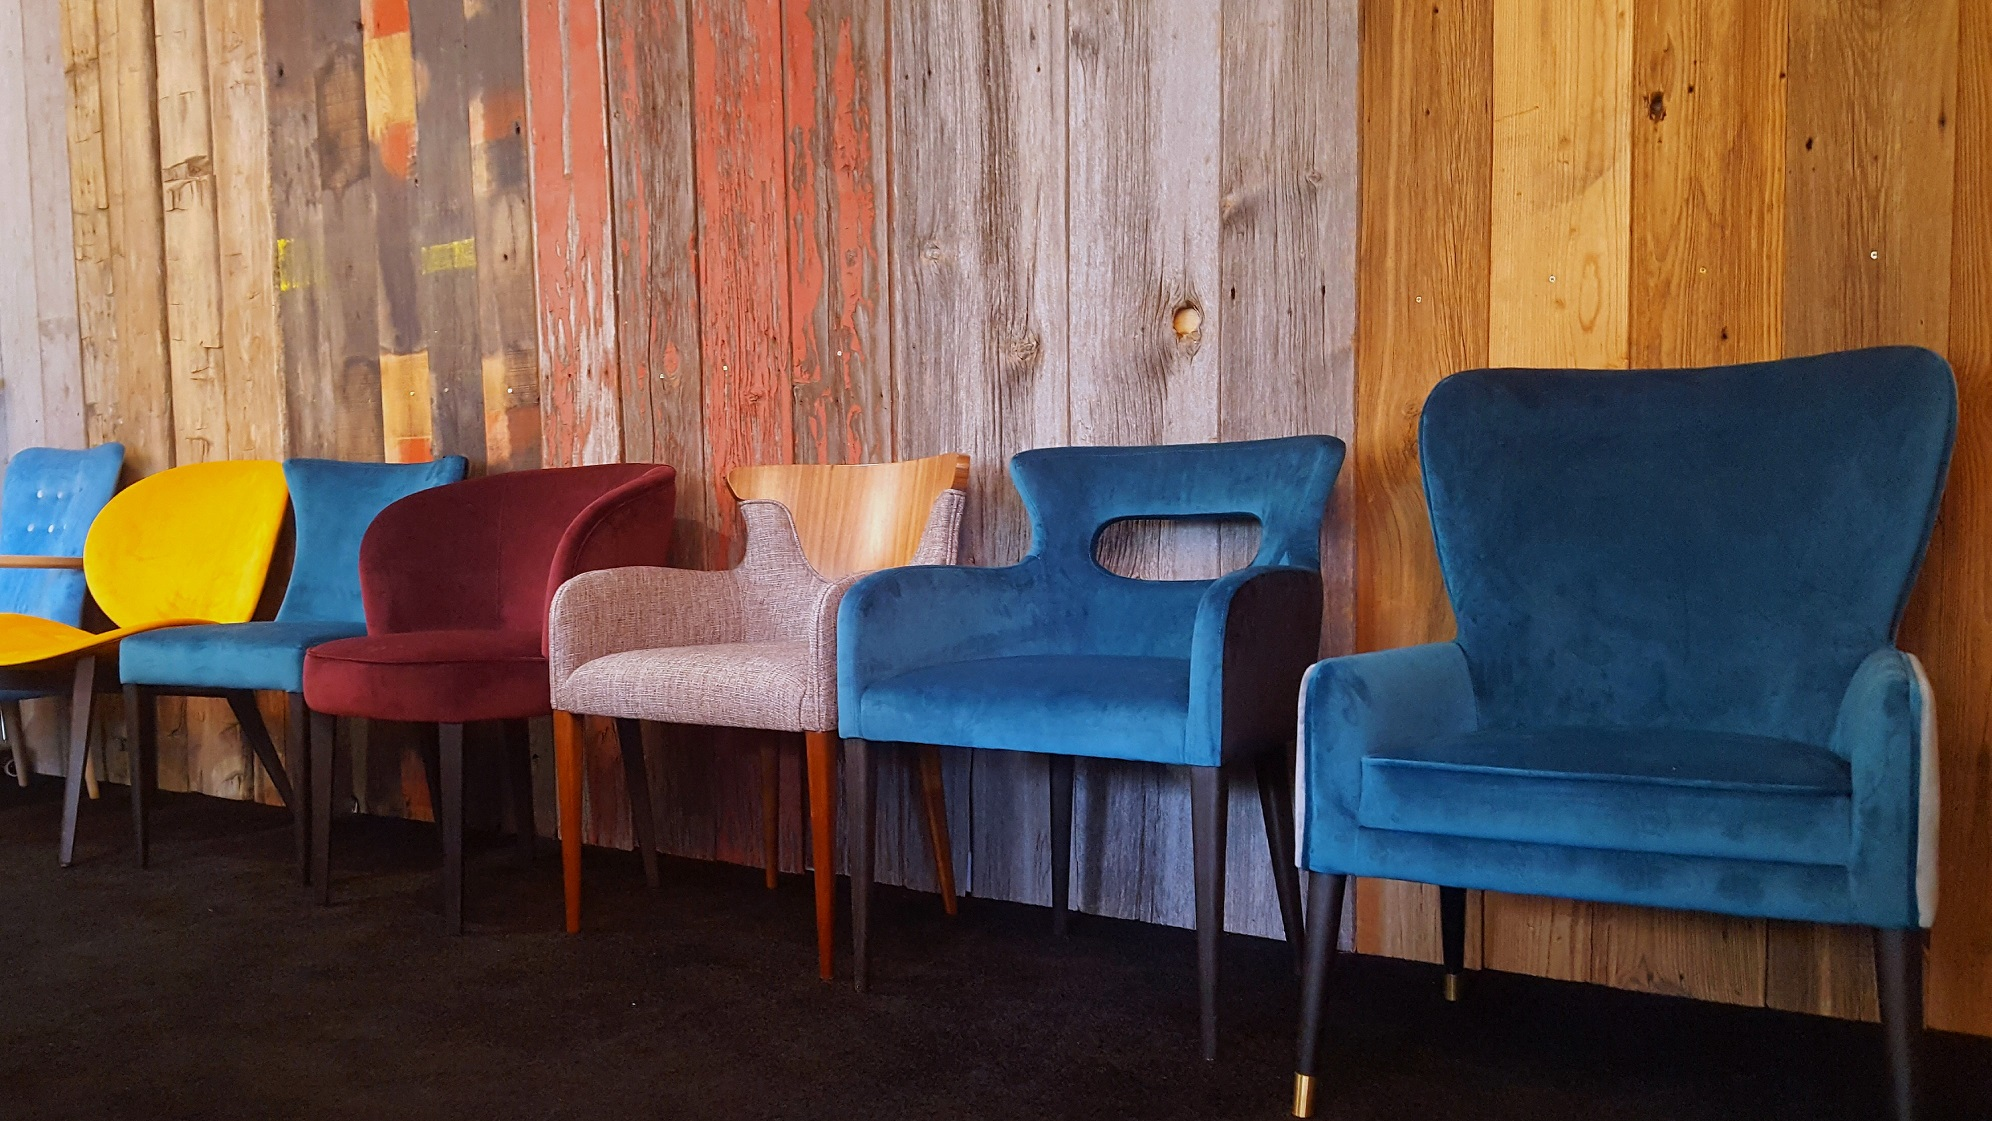 fournisseur mobilier professionnel hotel restaurant collectivit s. Black Bedroom Furniture Sets. Home Design Ideas